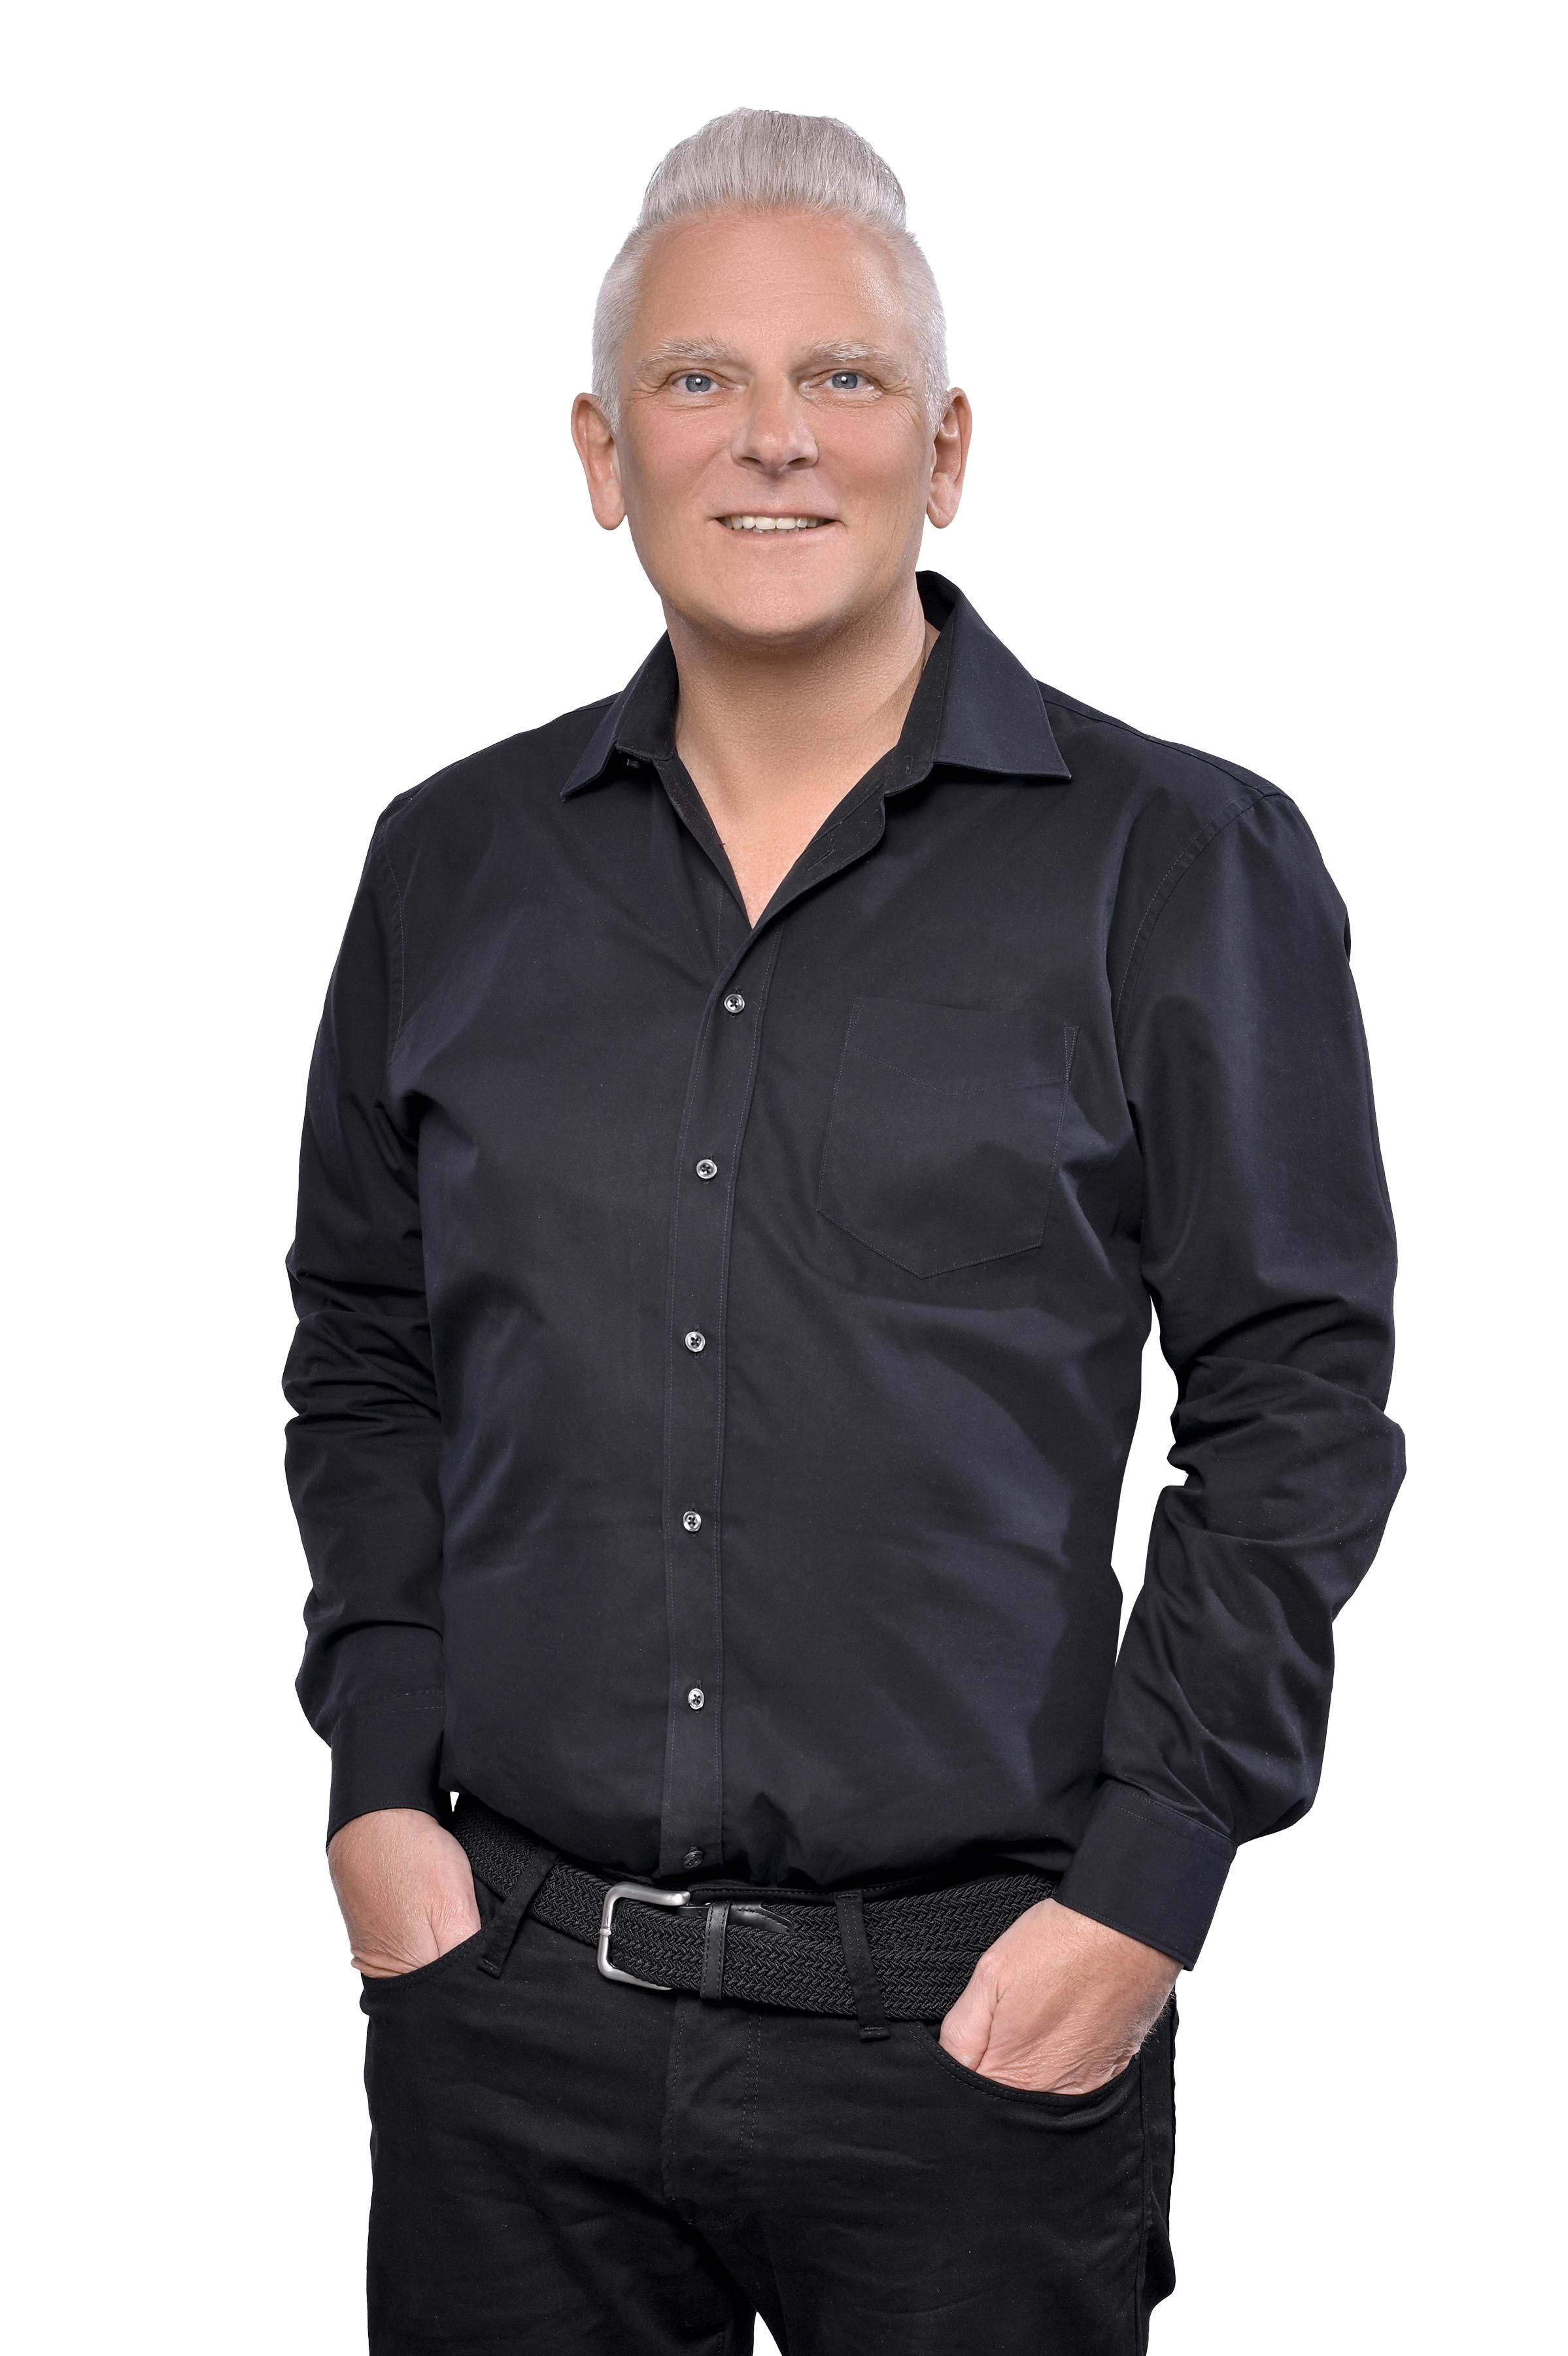 Inhaber Andreas Topp